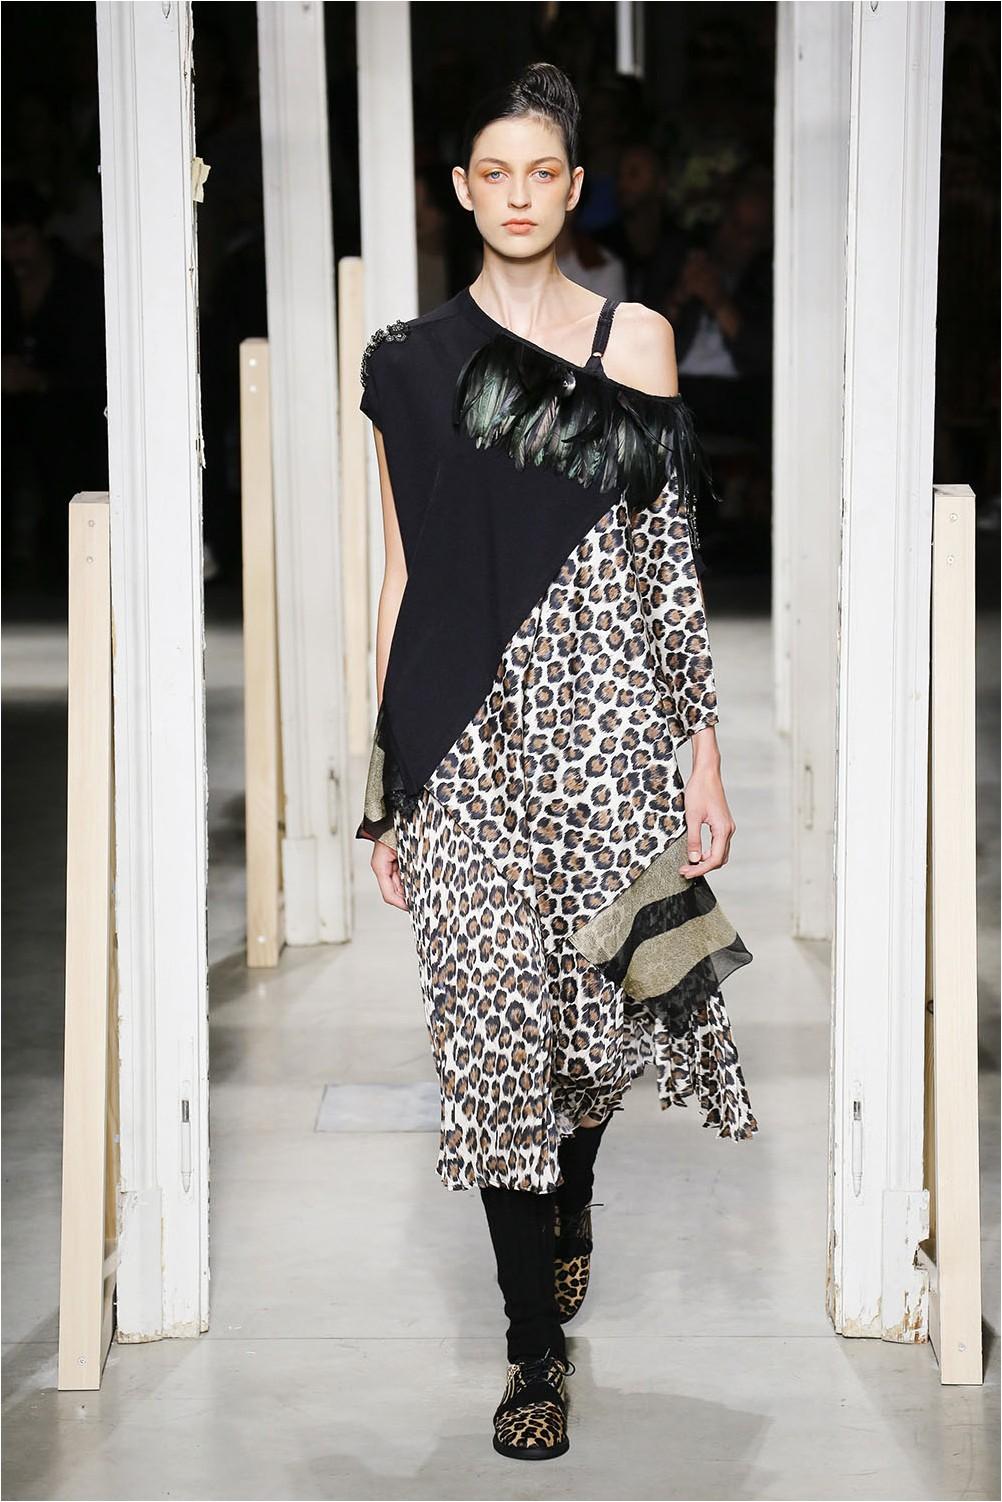 Asymmetrical dress by Antonio Marras